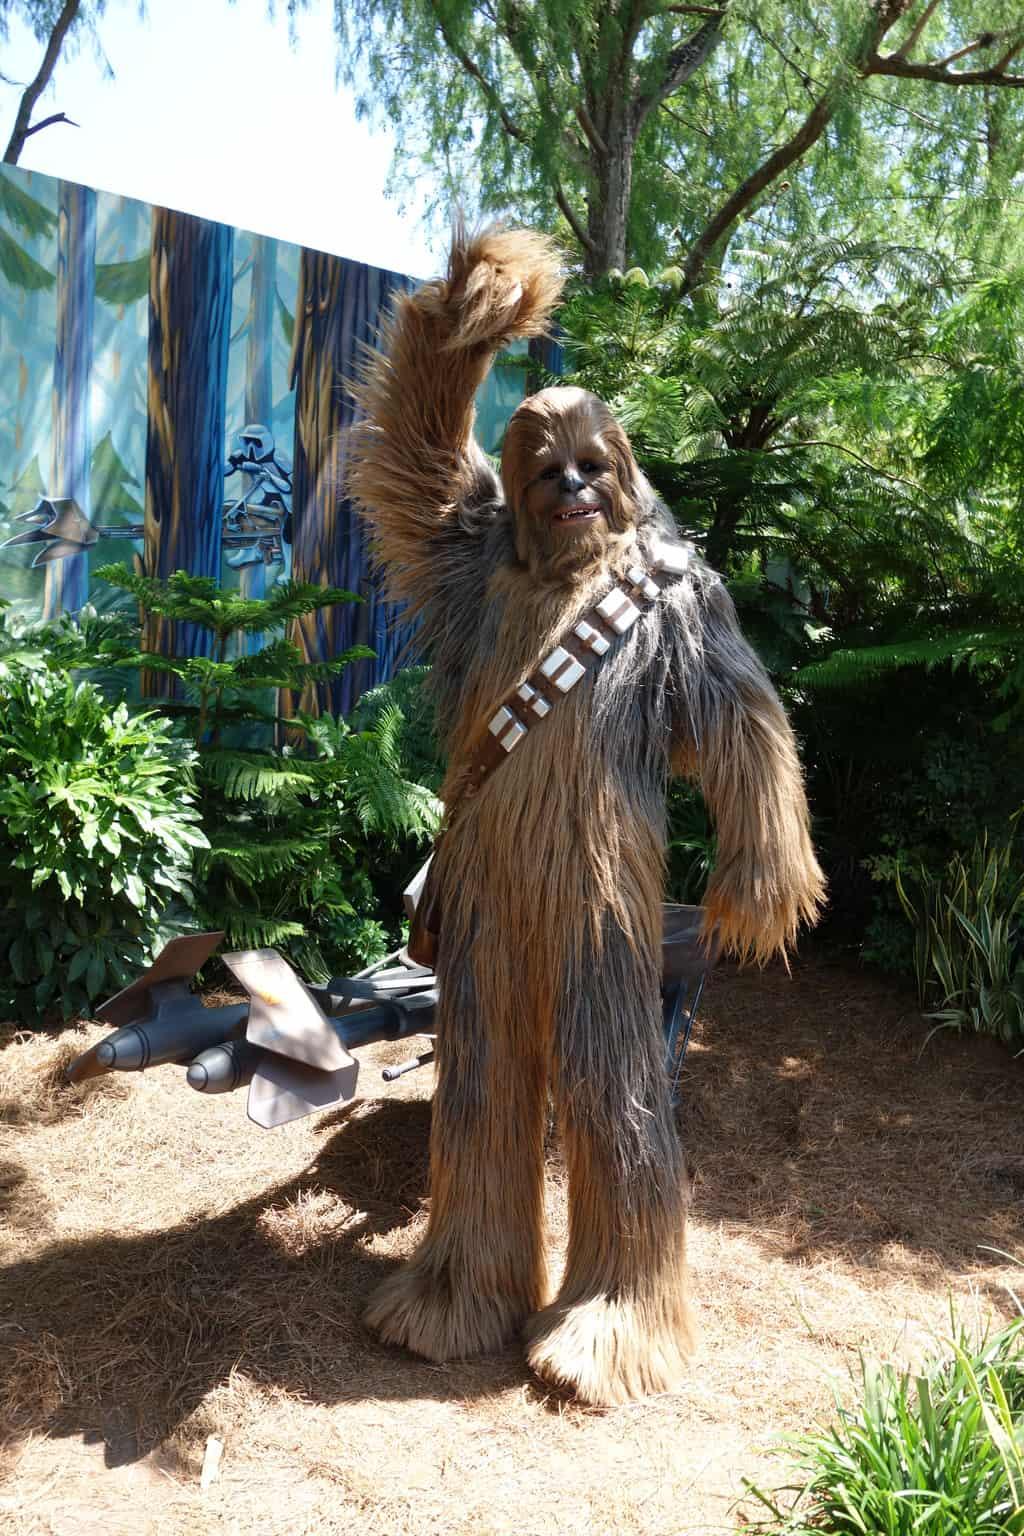 Chewbacca Star Wars Weekends 2013